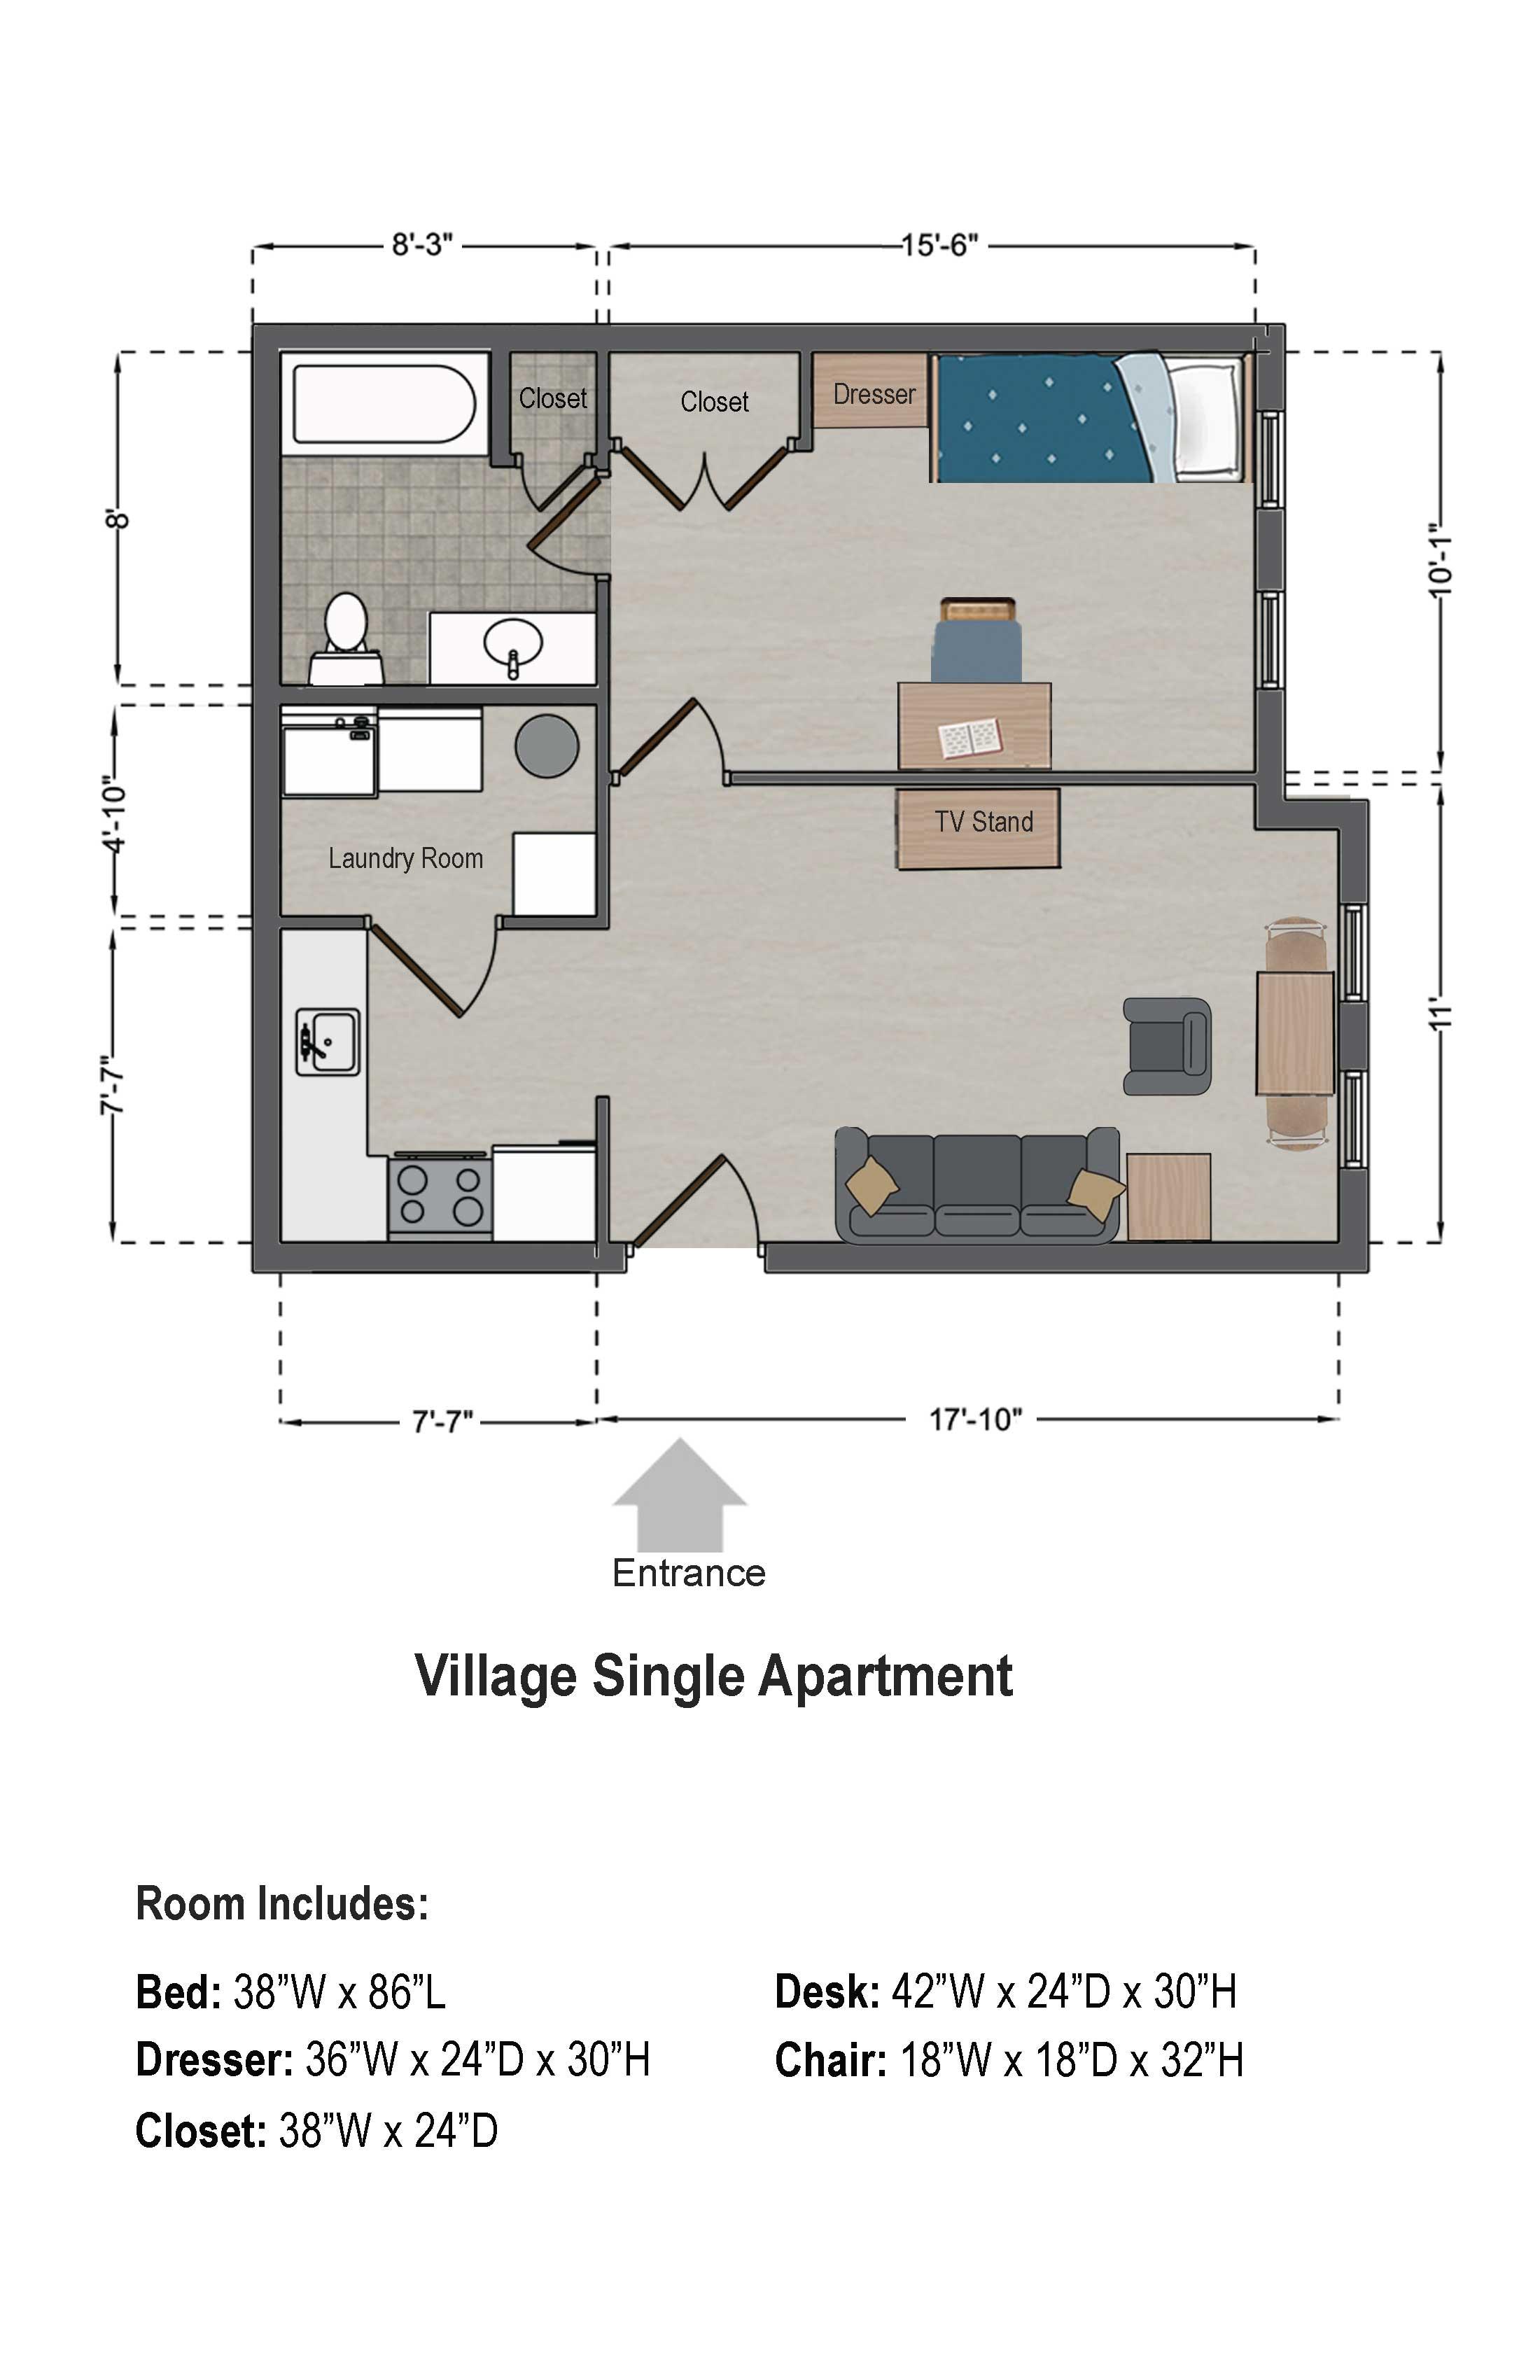 Open Floor Plan Kitchen Dining Room And Living Room